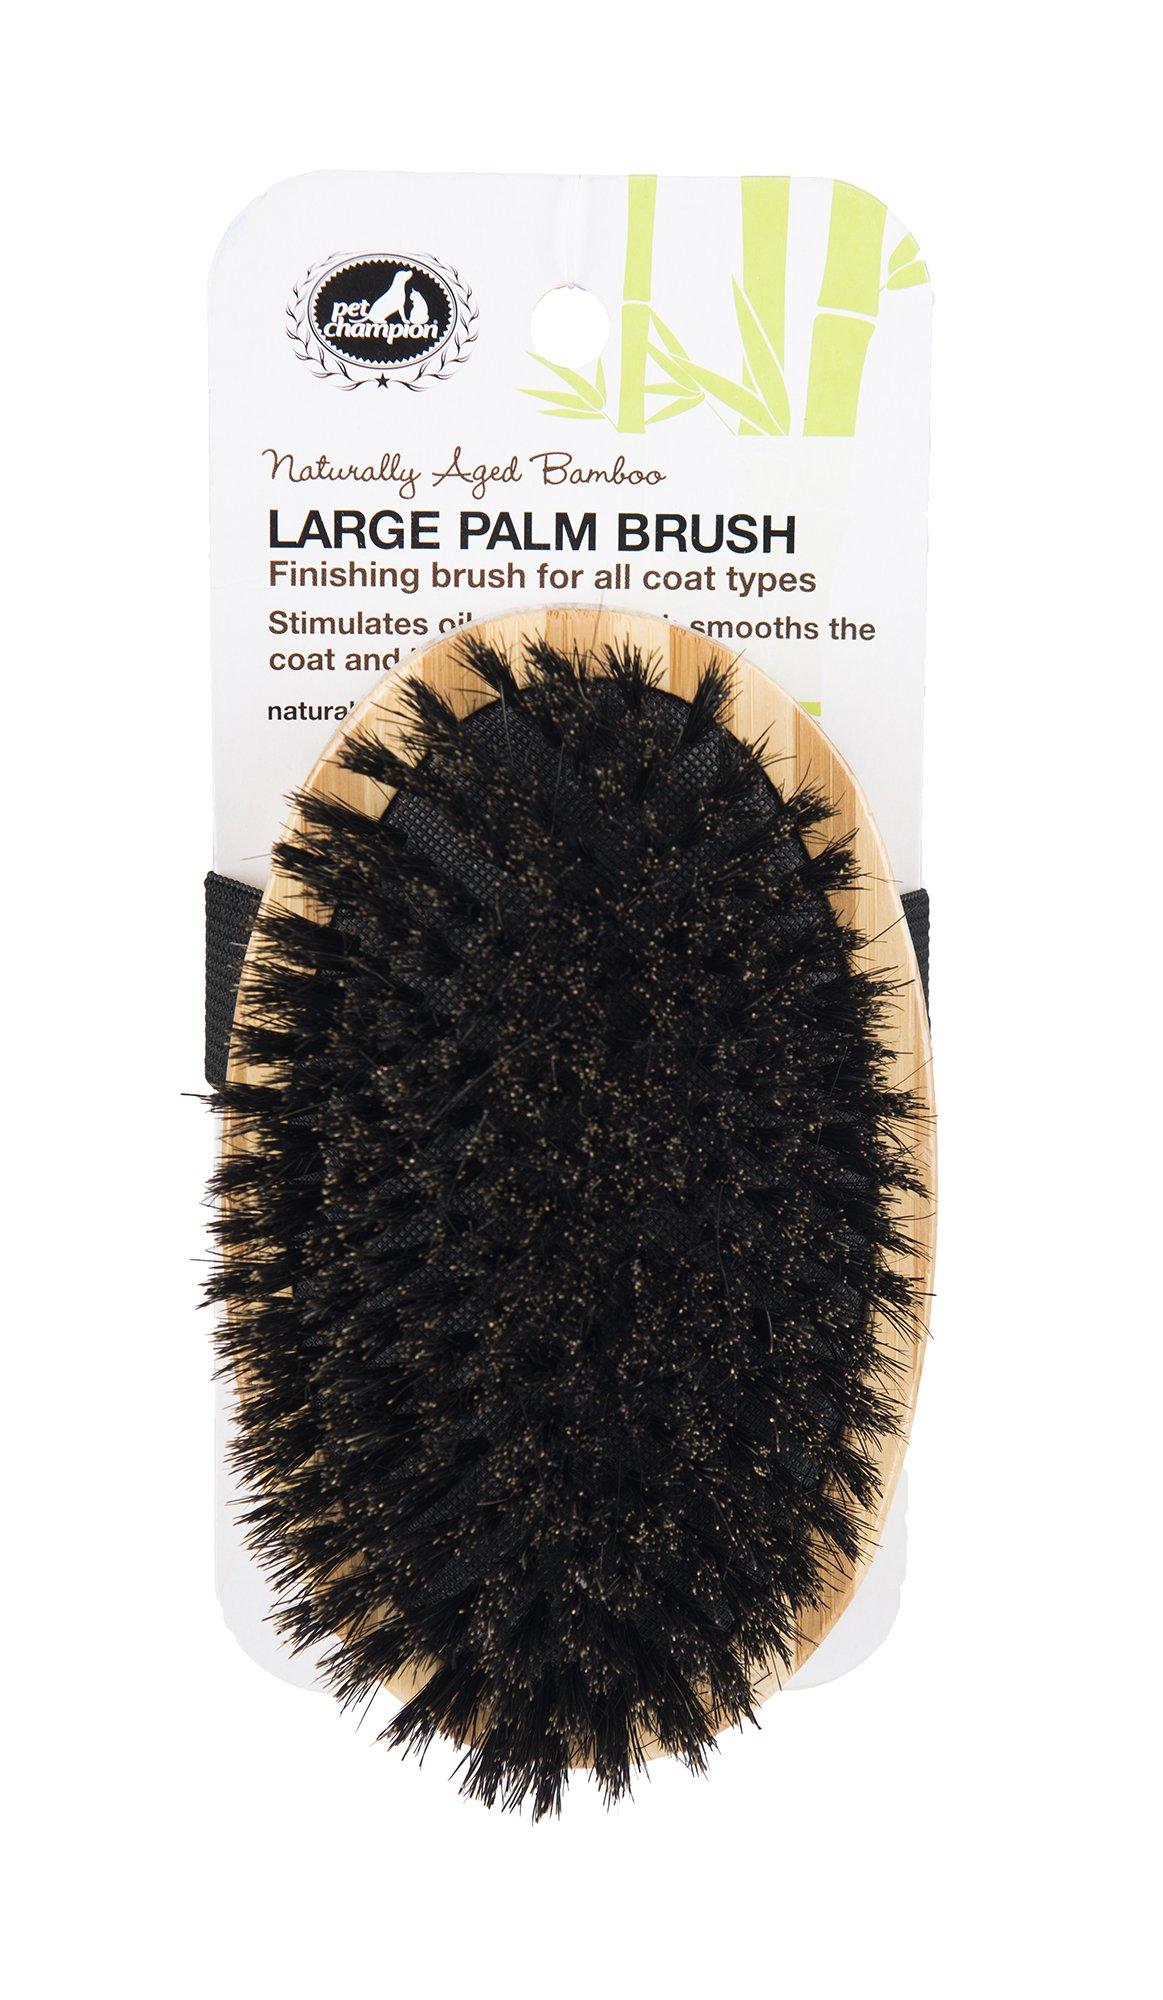 Pet Champion PTBBPLMBR All Natural Bristle Bamboo Palm Pet Brush, Large, Brown